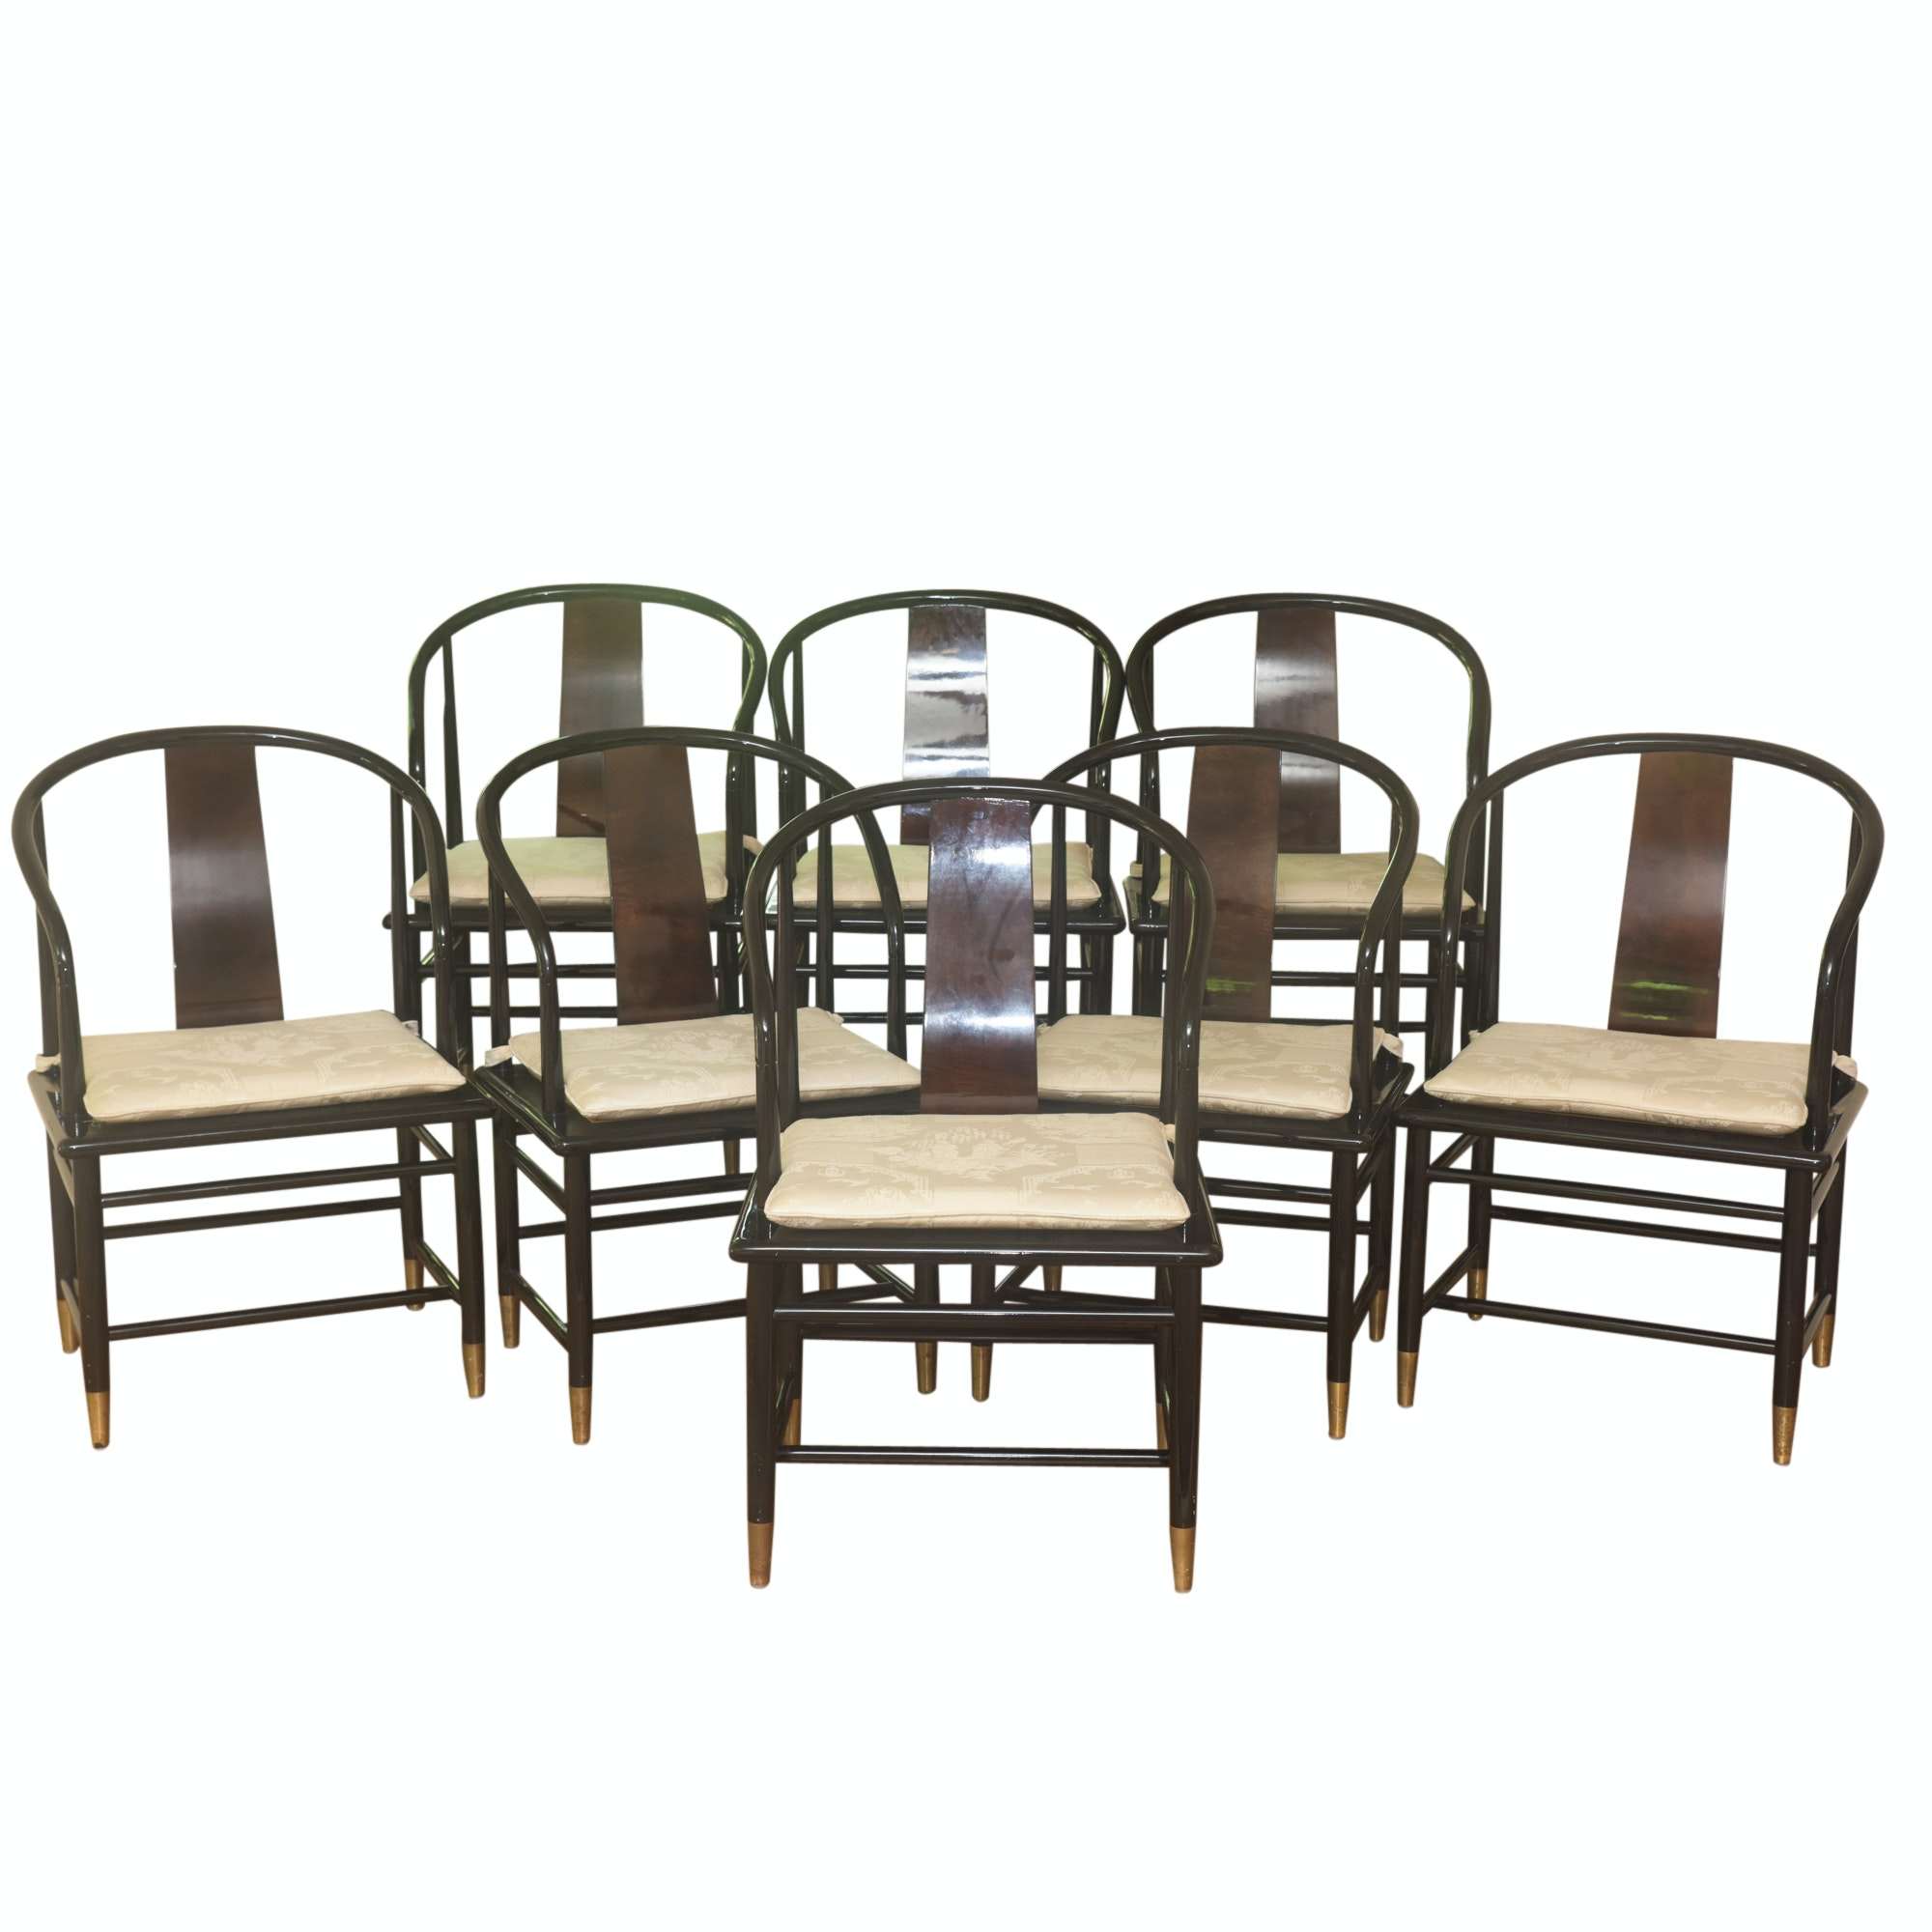 Scene Three  Dining Chairs by Henredon  EBTH  sc 1 st  EBTH.com & Scene Three